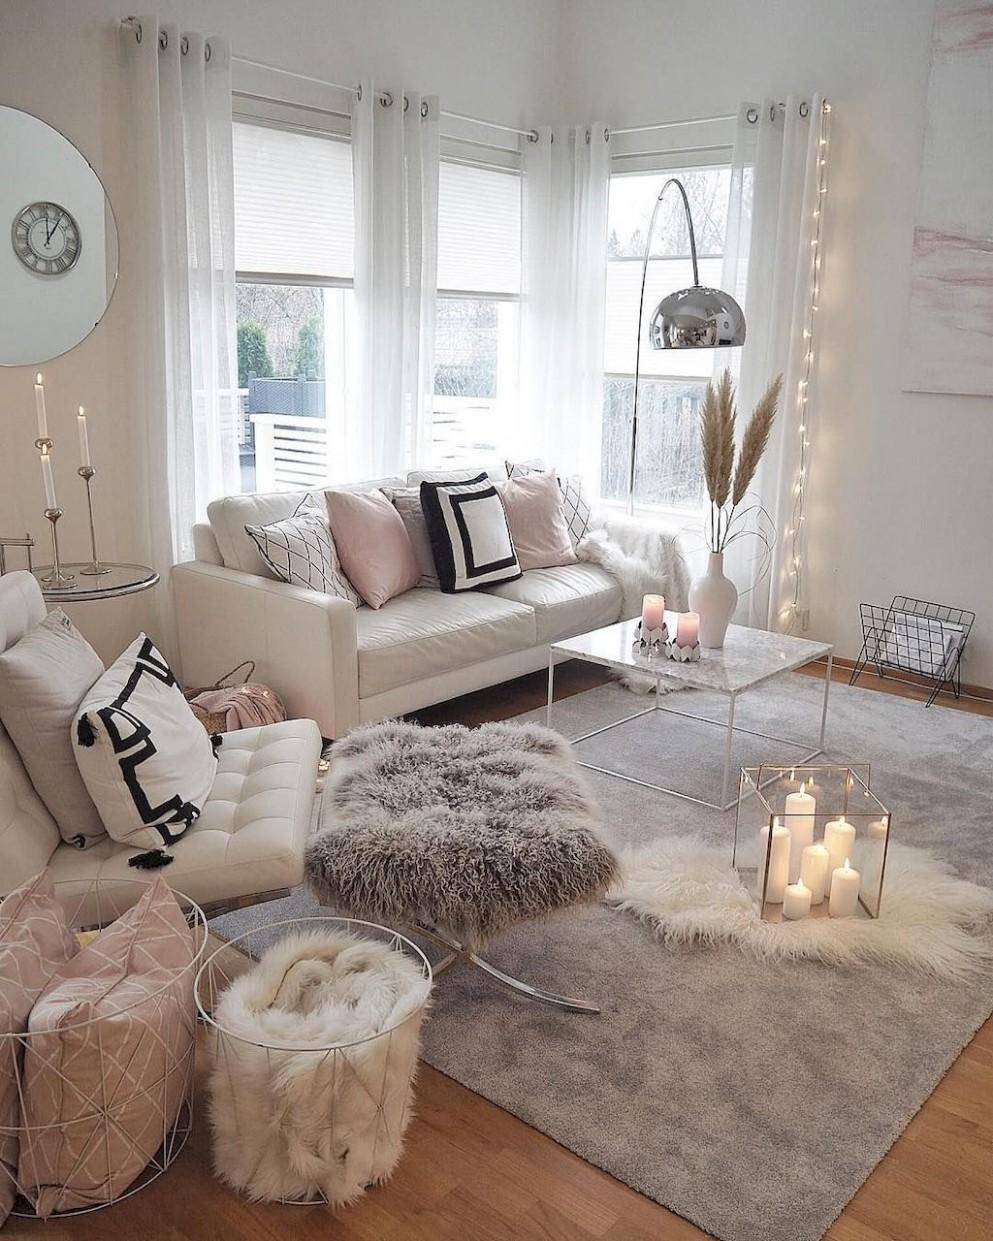 10 Cozy Apartment Living Room Decorating Ideas - decorationroom  - Apartment Living Room Decor Ideas